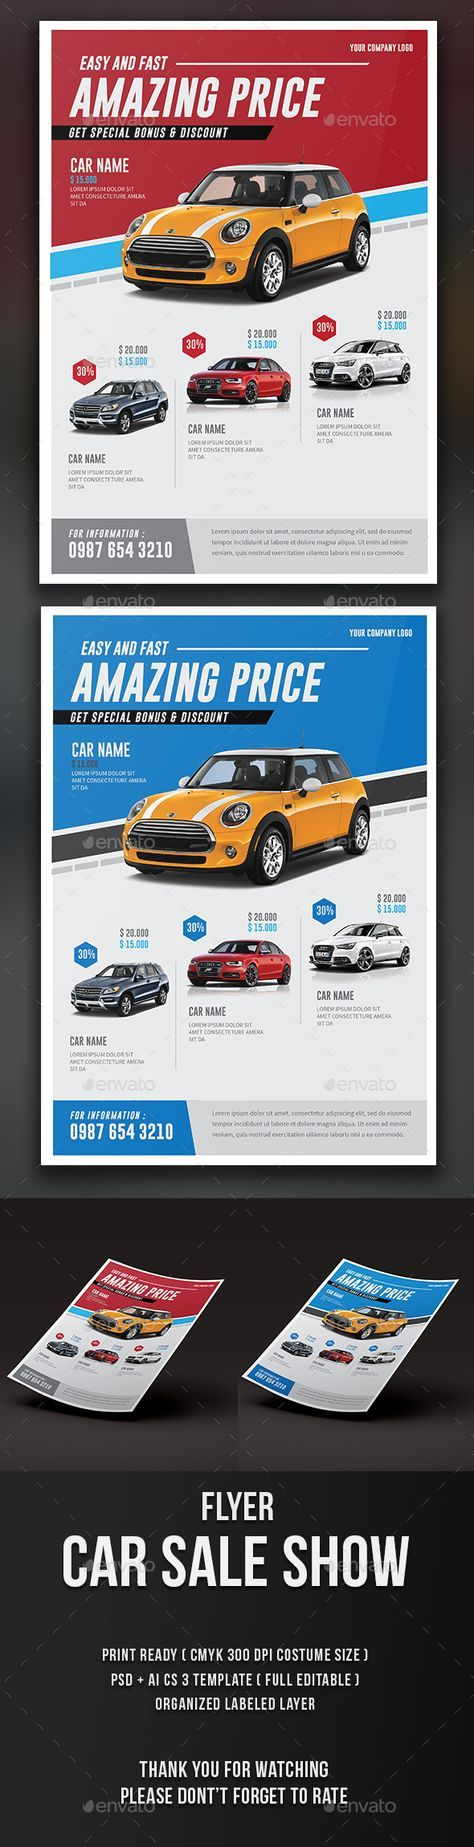 Car Sale Show Flyer Template PSD. Download here: http://graphicriver.net/item/car-sale-show-flyer/15757021?ref=ksioks